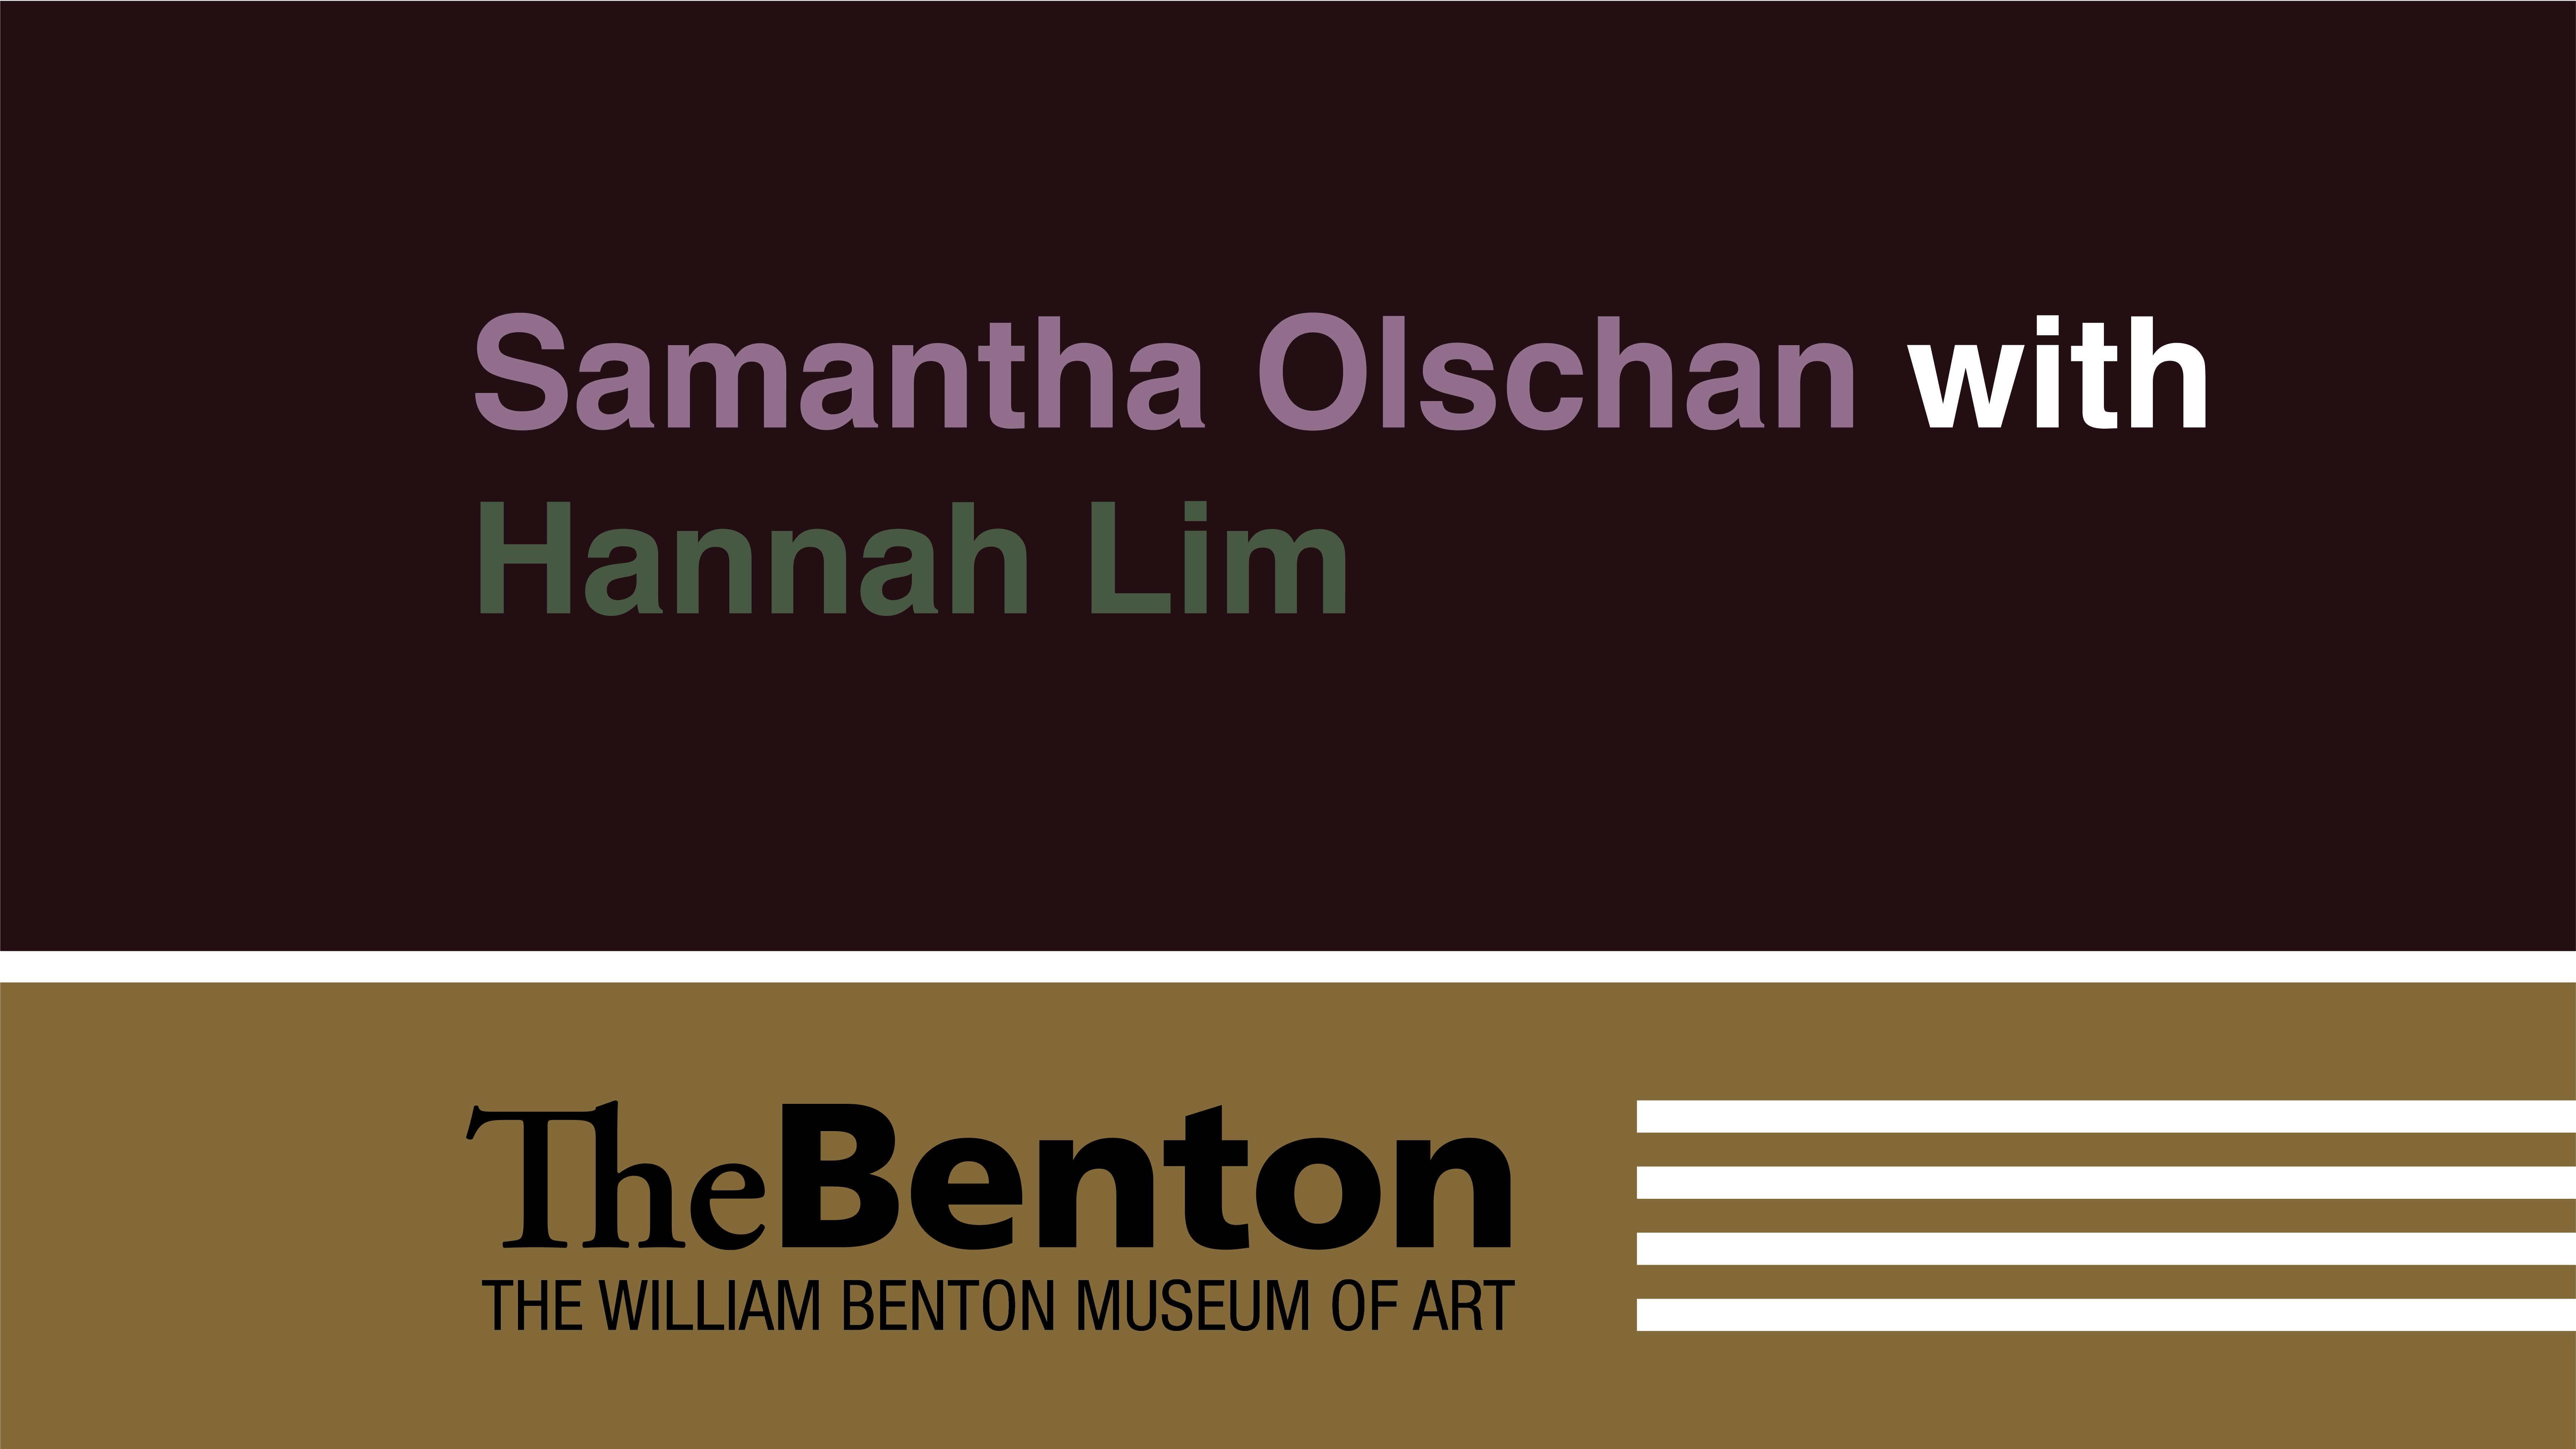 Samantha Olschan with Hannah Lim